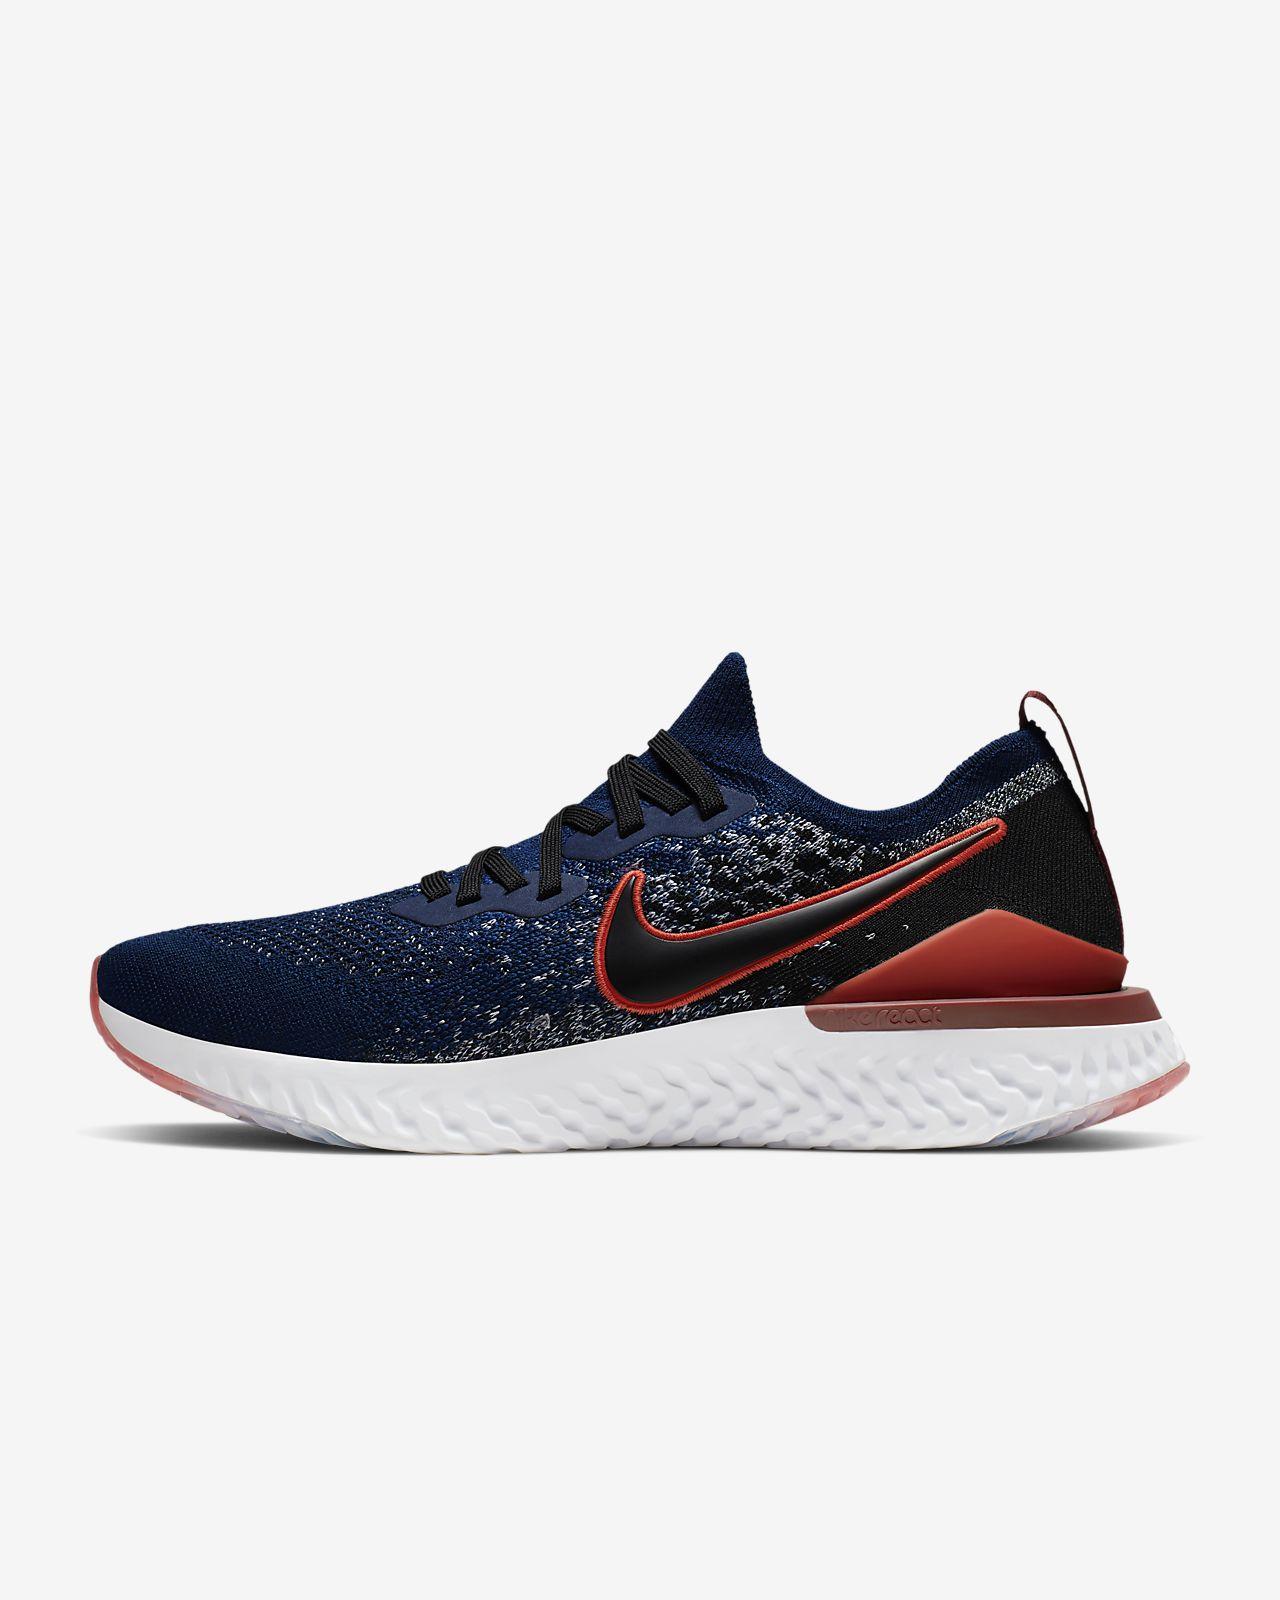 Nike ID Oreo free run 2 custom